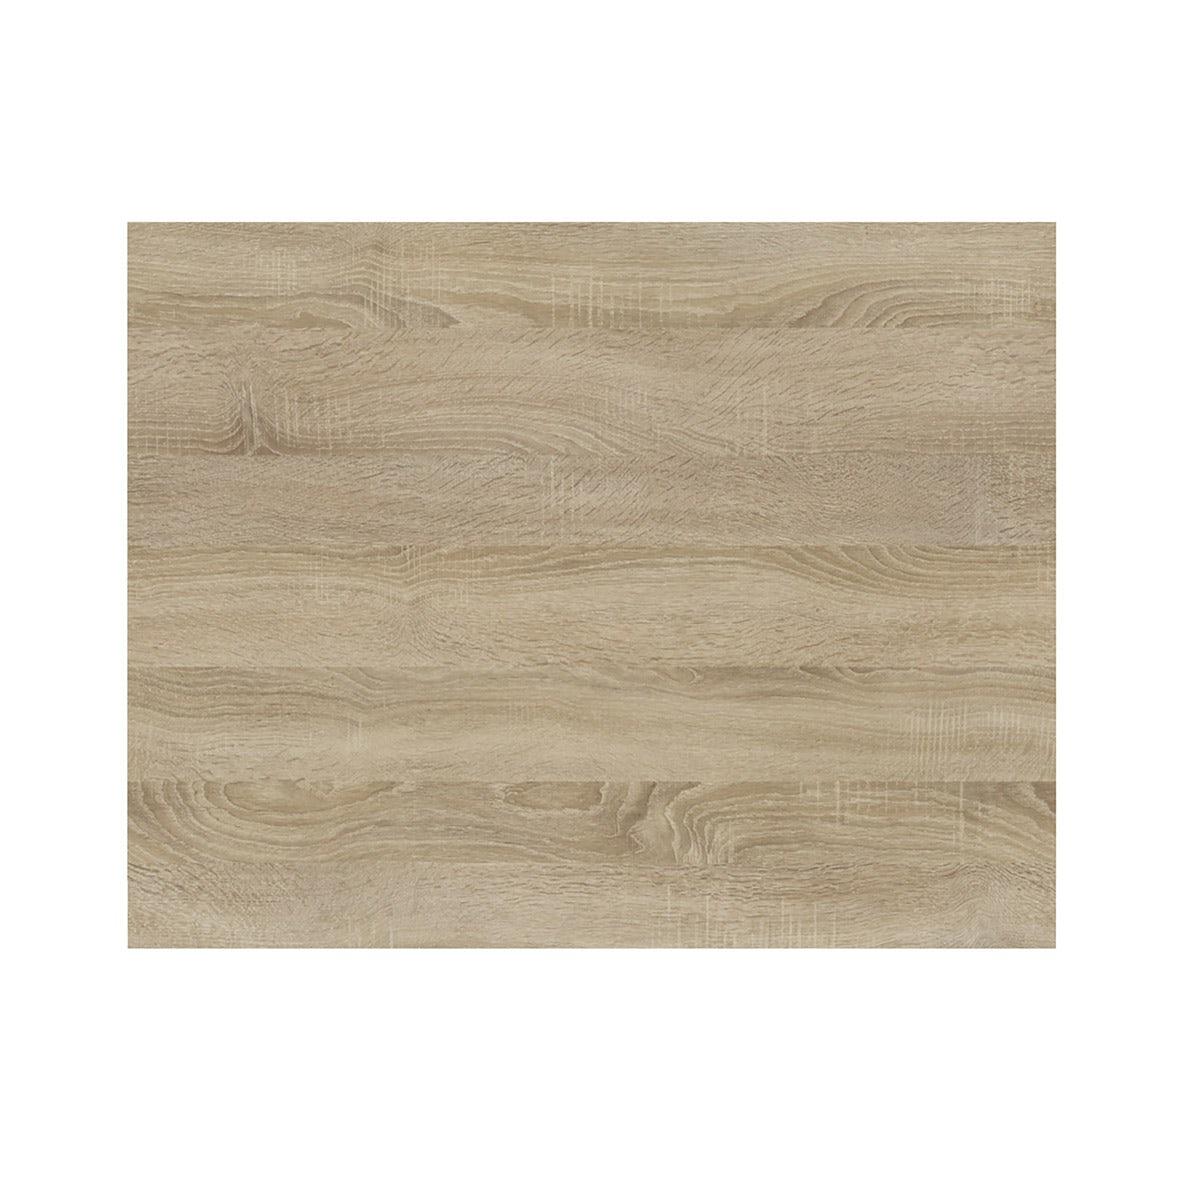 Wye oak boston shower bath end panel 680mm